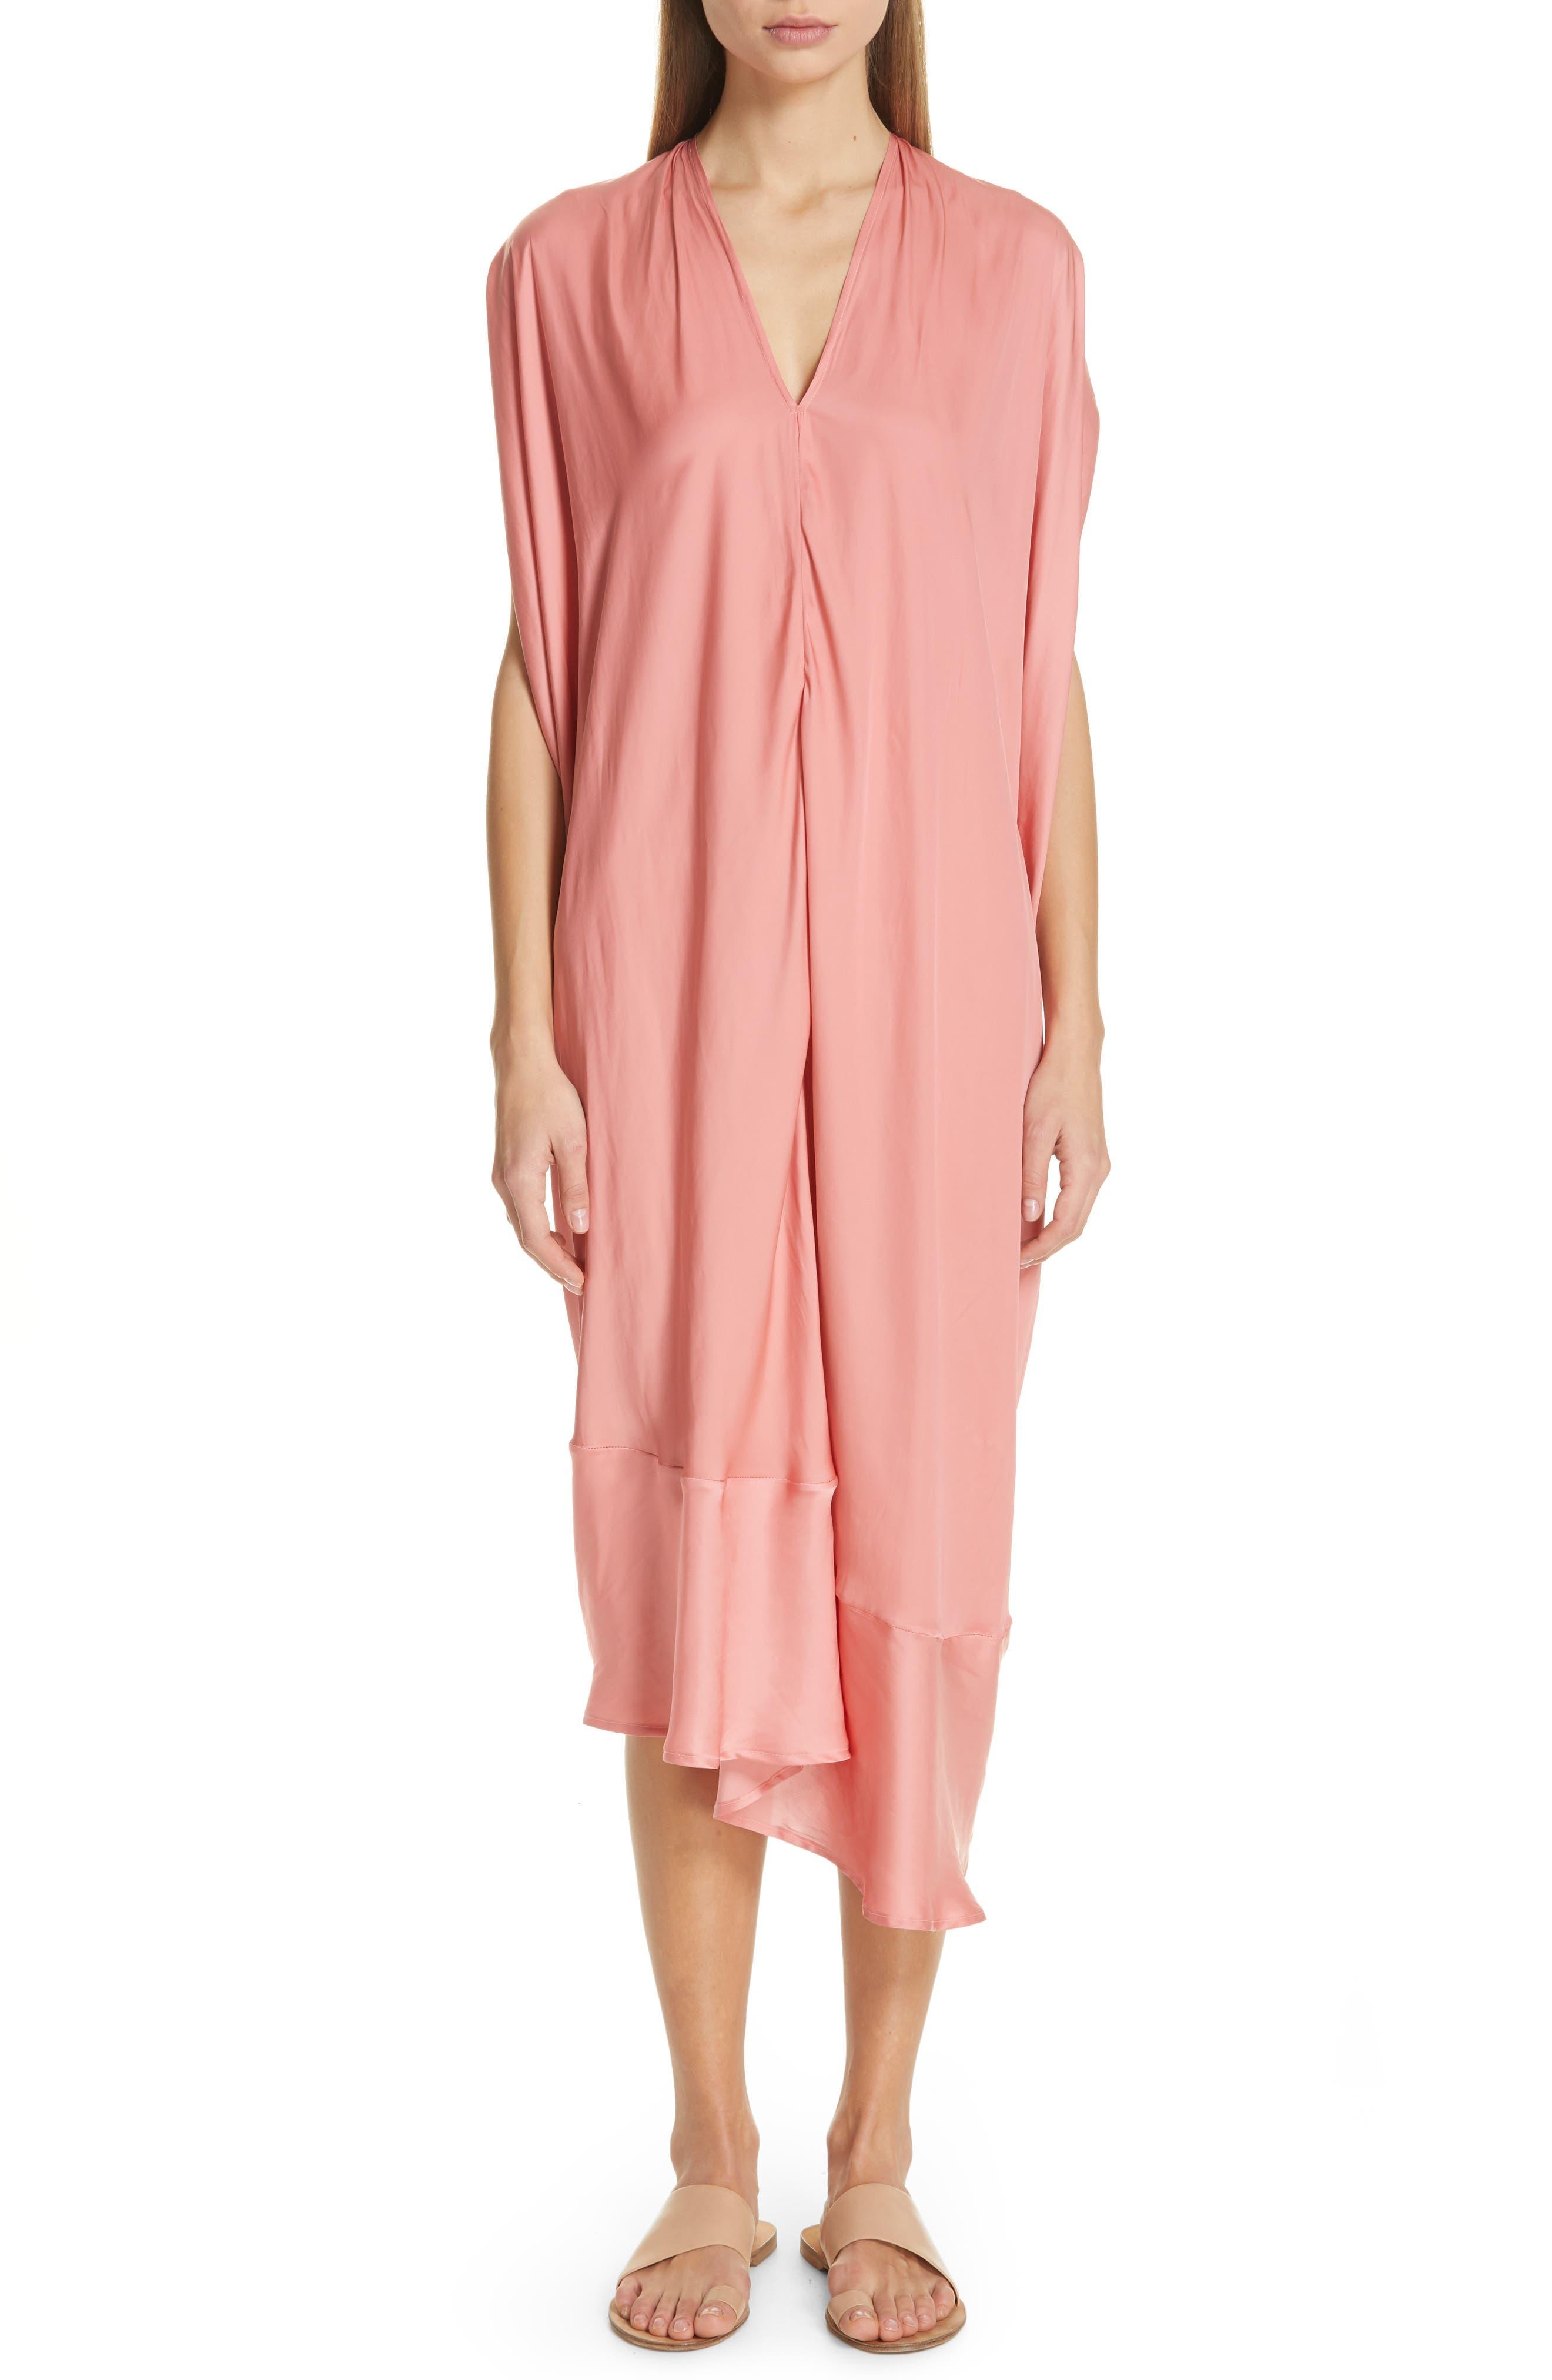 Zero + Maria Cornejo Lila Drift Dress